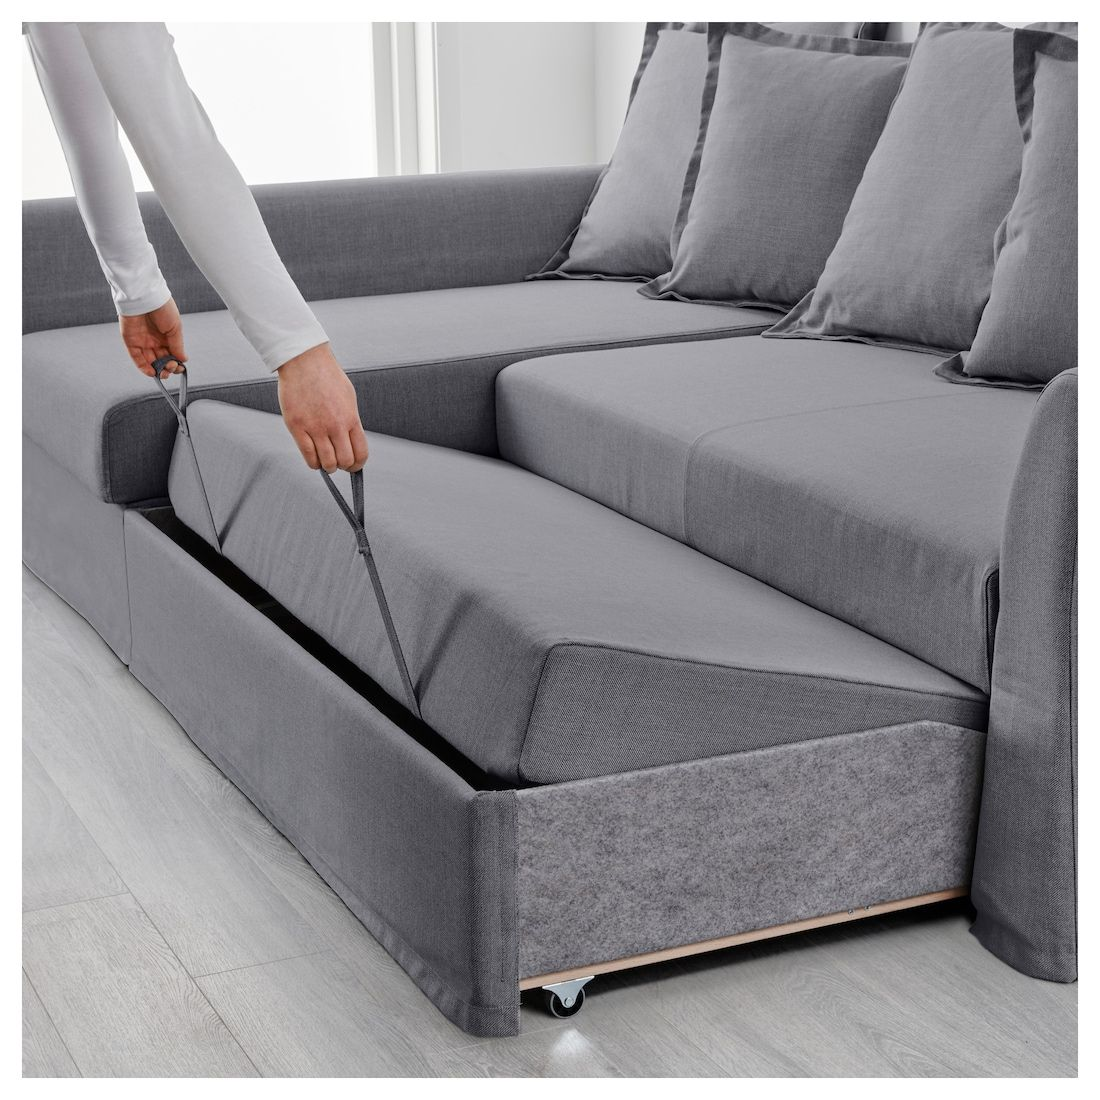 Home Furniture Store Modern Furnishings Décor Corner Sofa Bed Ikea Sectional Sofa Sectional Sleeper Sofa